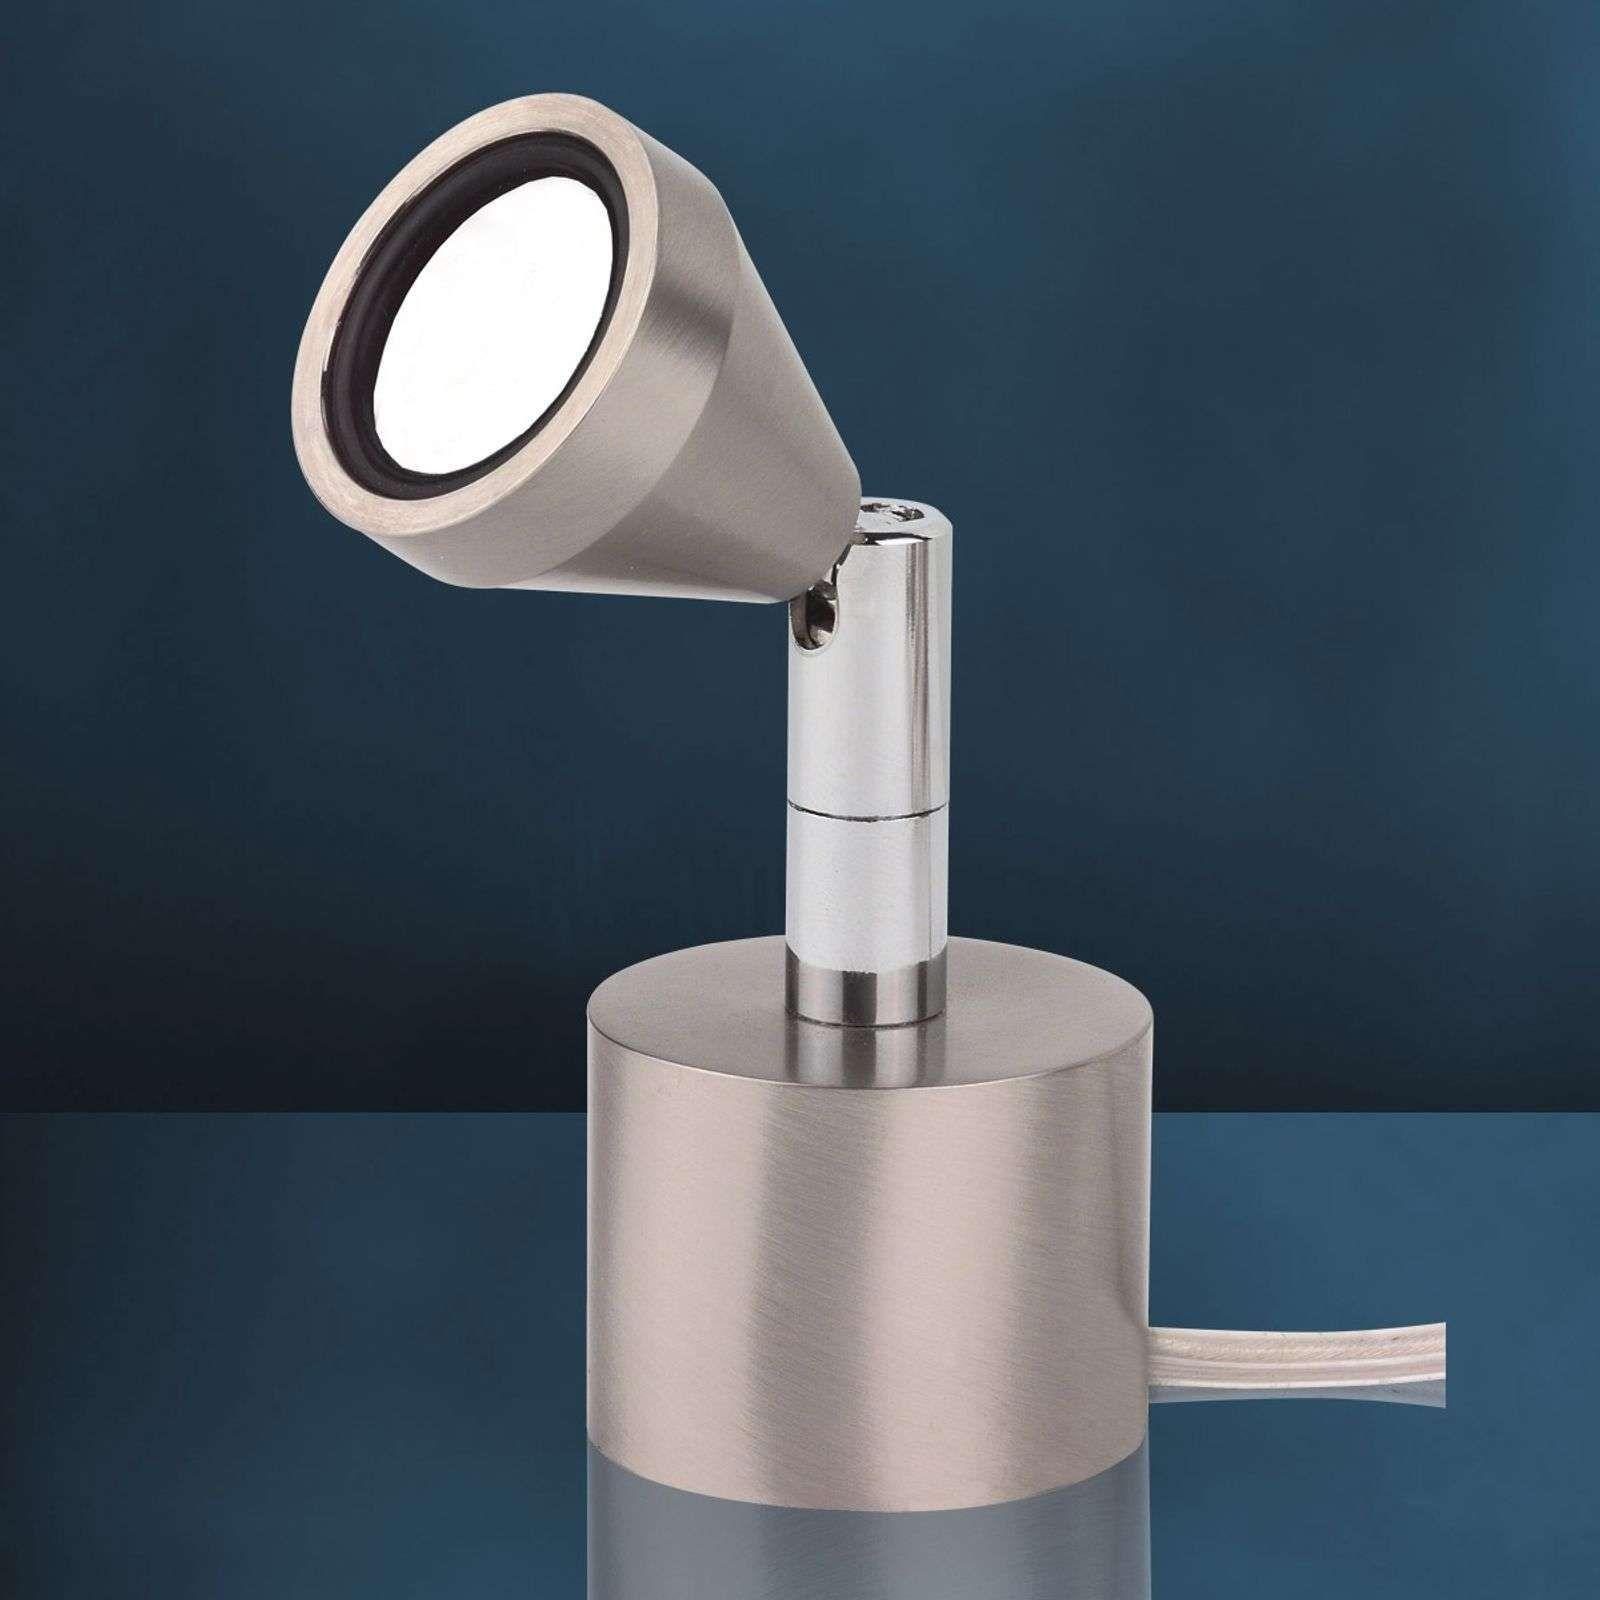 Schlafzimmer Lampe Gunstig Glas Tischlampe Nachttischlampe Touch Led Tisc In 2020 Wall Lamp Design Led Table Lamp Unique Lamps